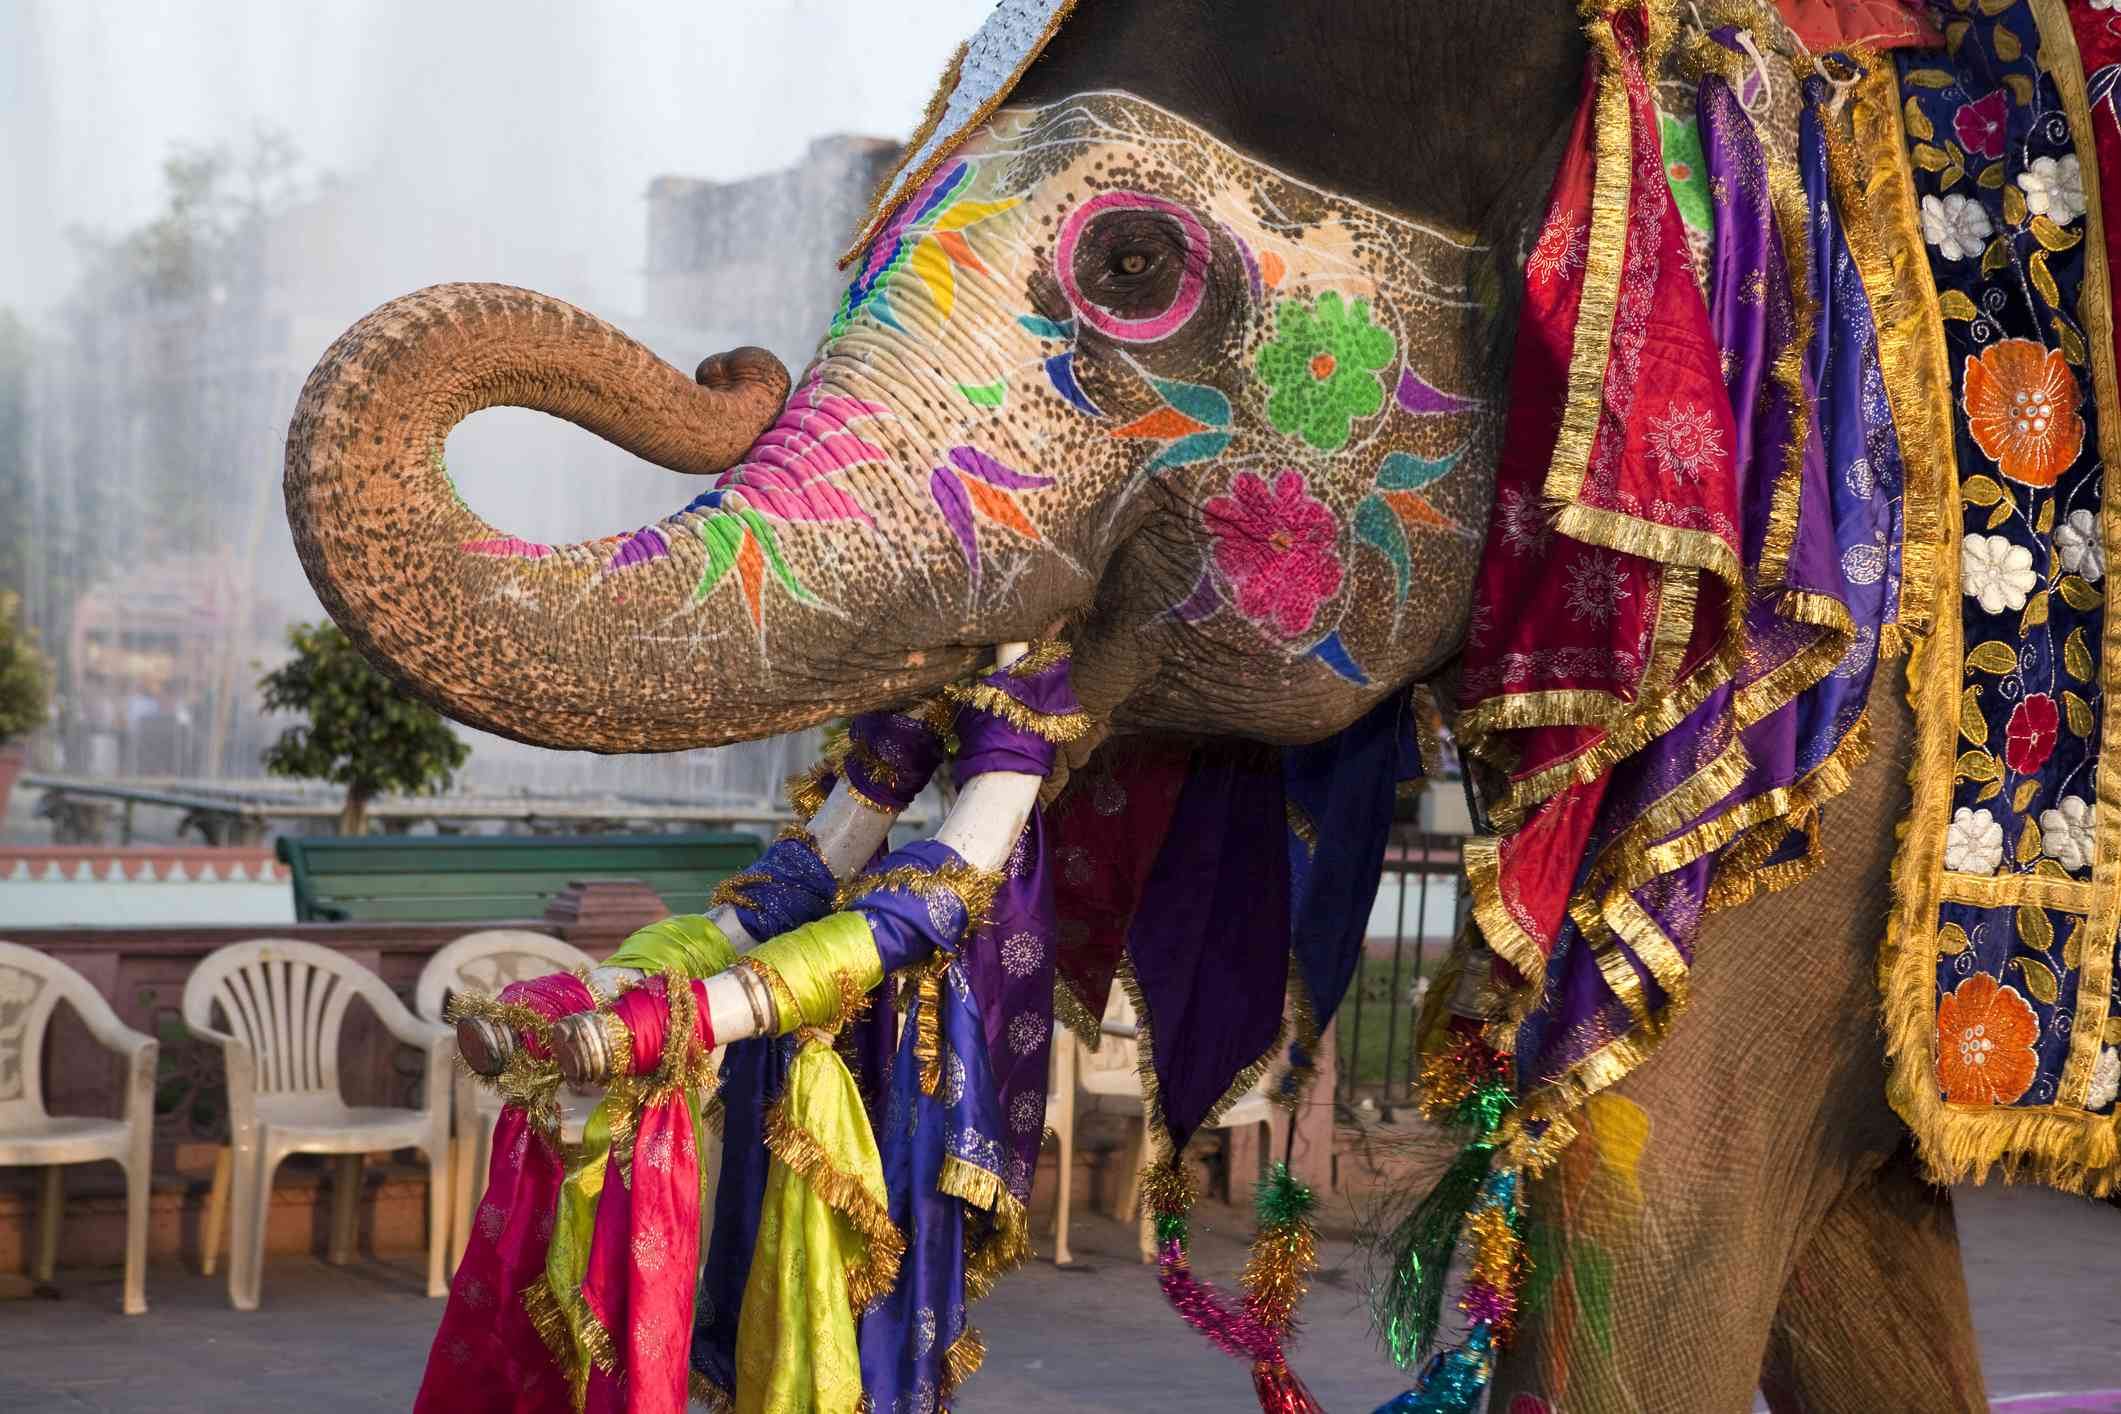 Gangaur elephant festival in Jaipur, India